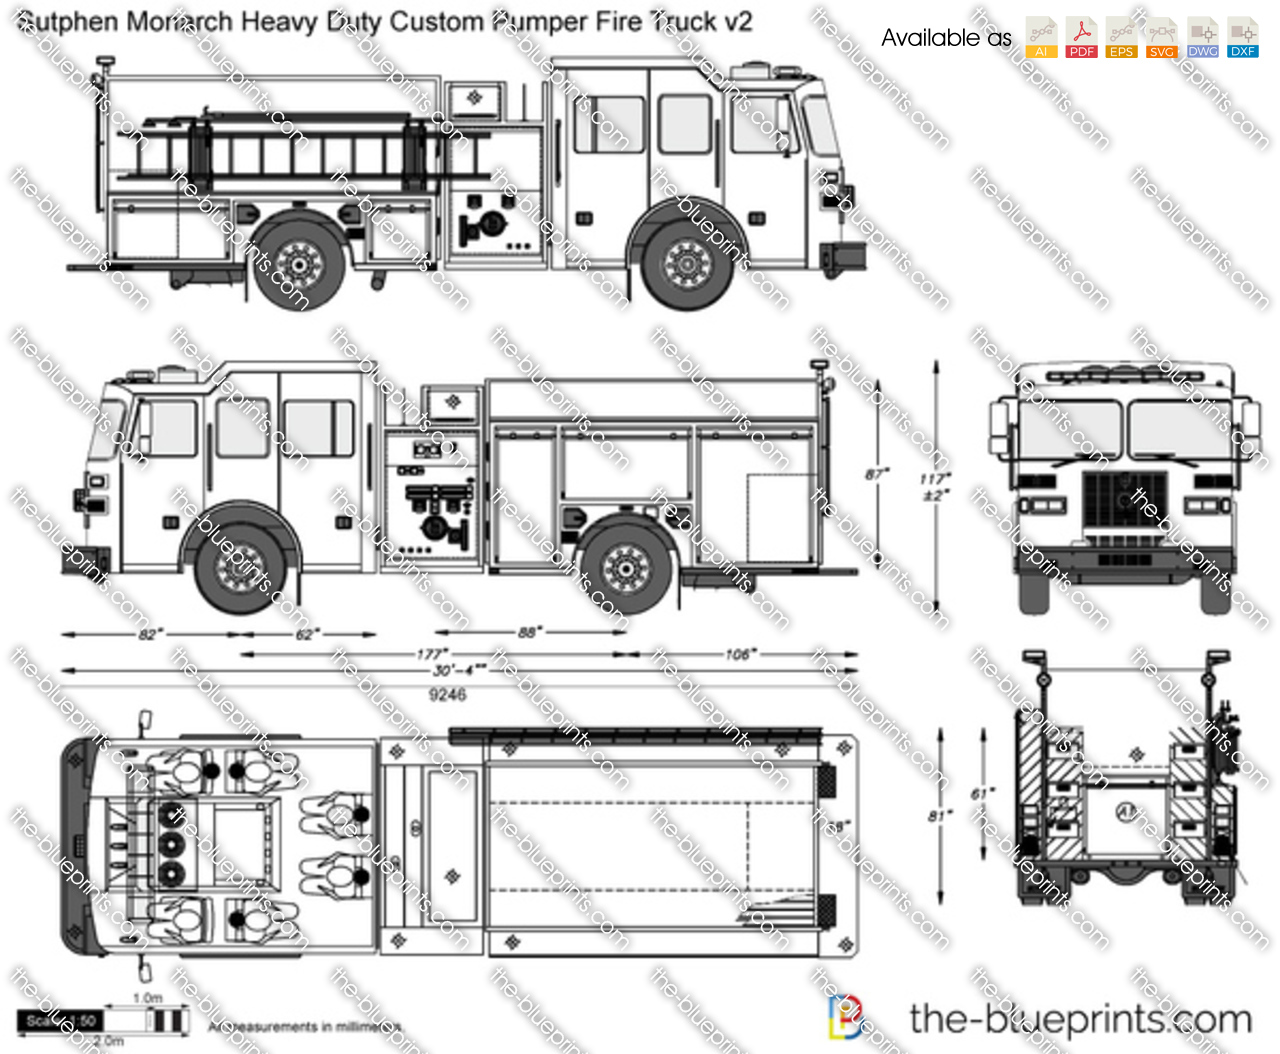 sutphen monarch heavy duty custom pumper fire truck v2